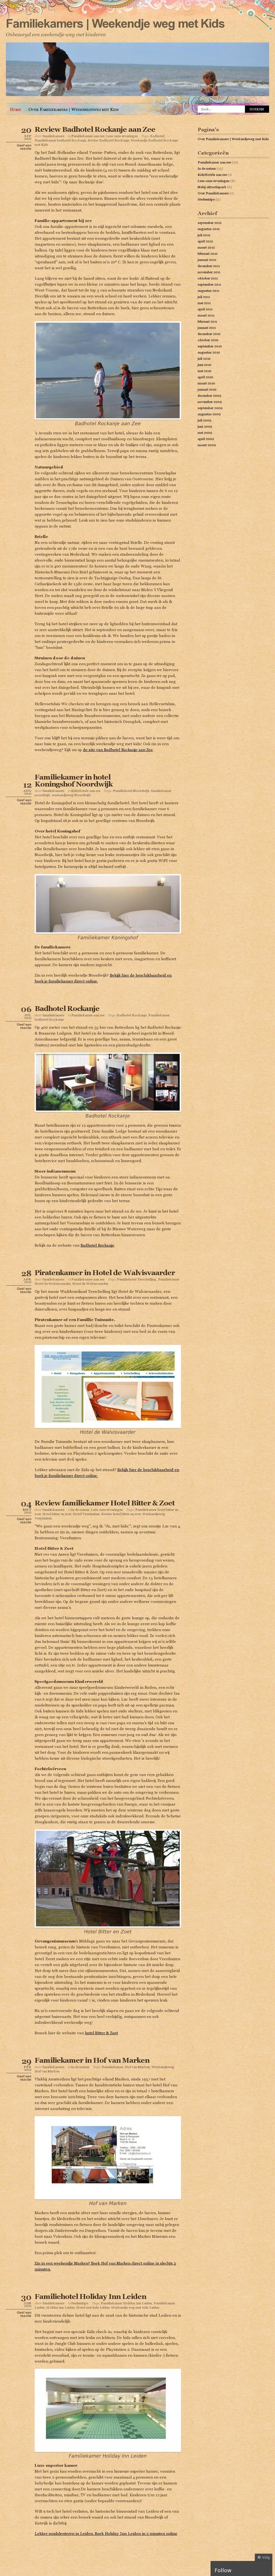 The website 'http://familiekamers.wordpress.com/' courtesy of @Pinstamatic (http://pinstamatic.com)